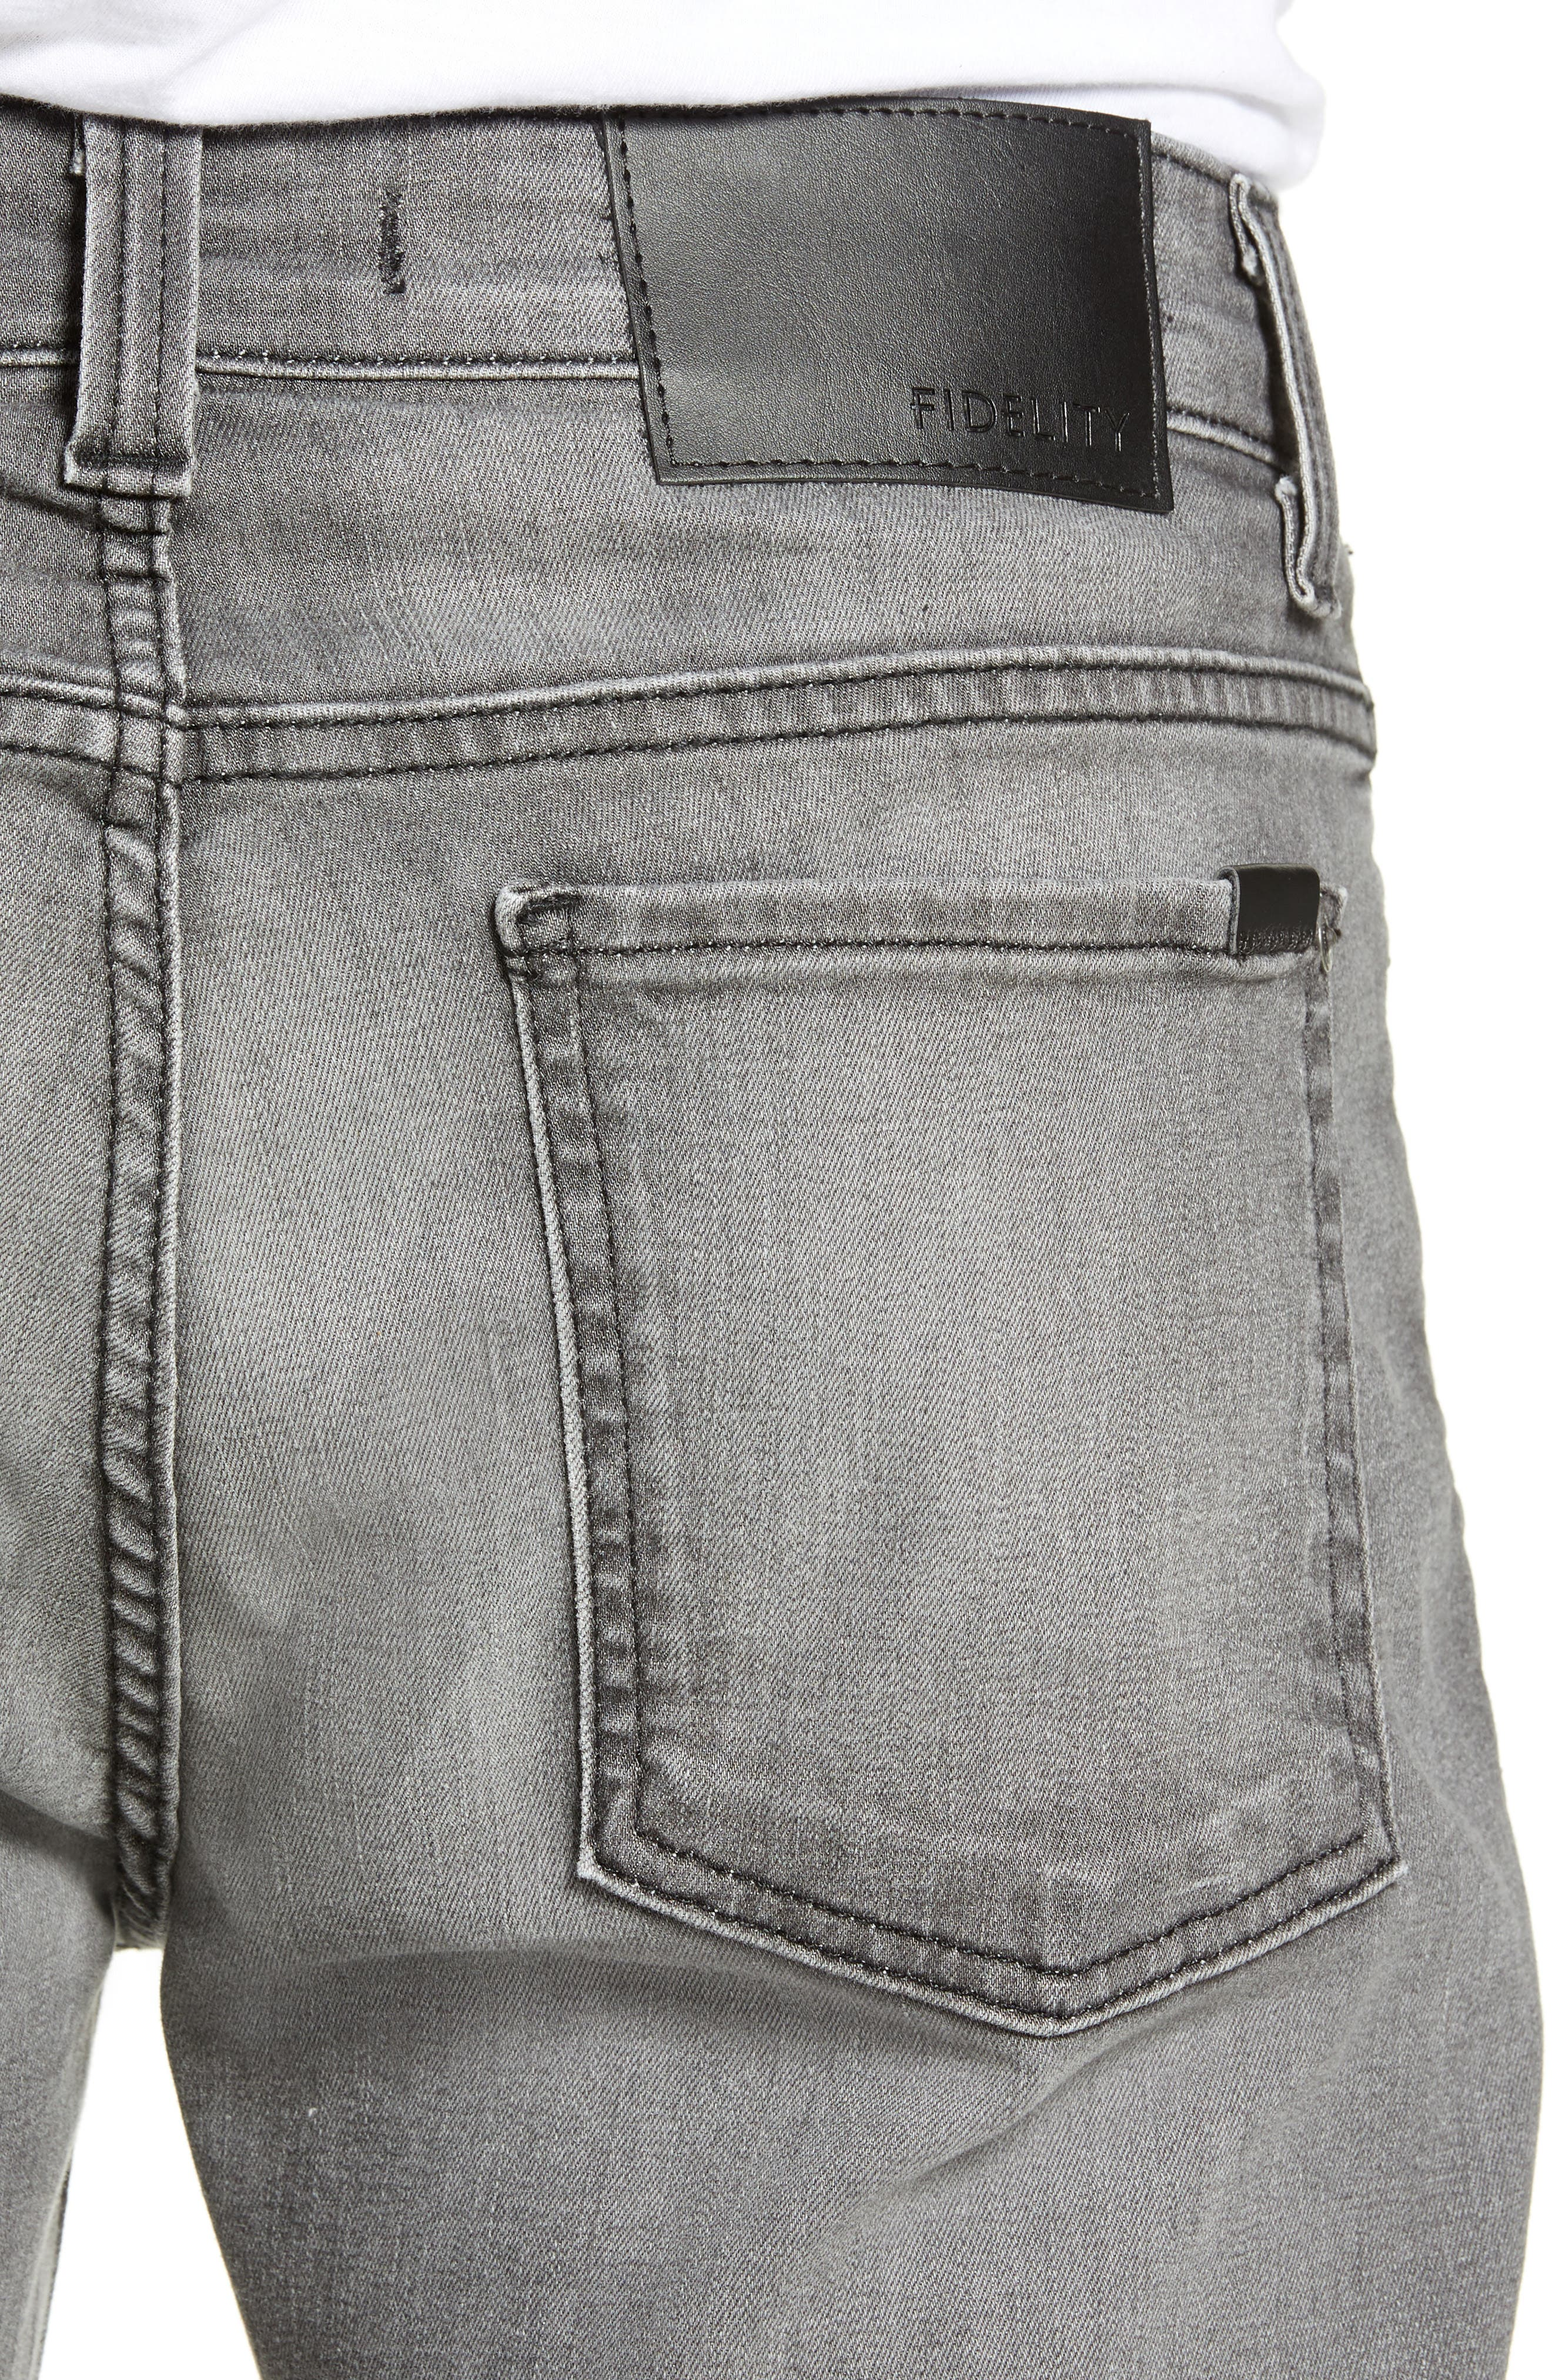 Torino Slim Fit Jeans,                             Alternate thumbnail 4, color,                             PHANTOM GREY